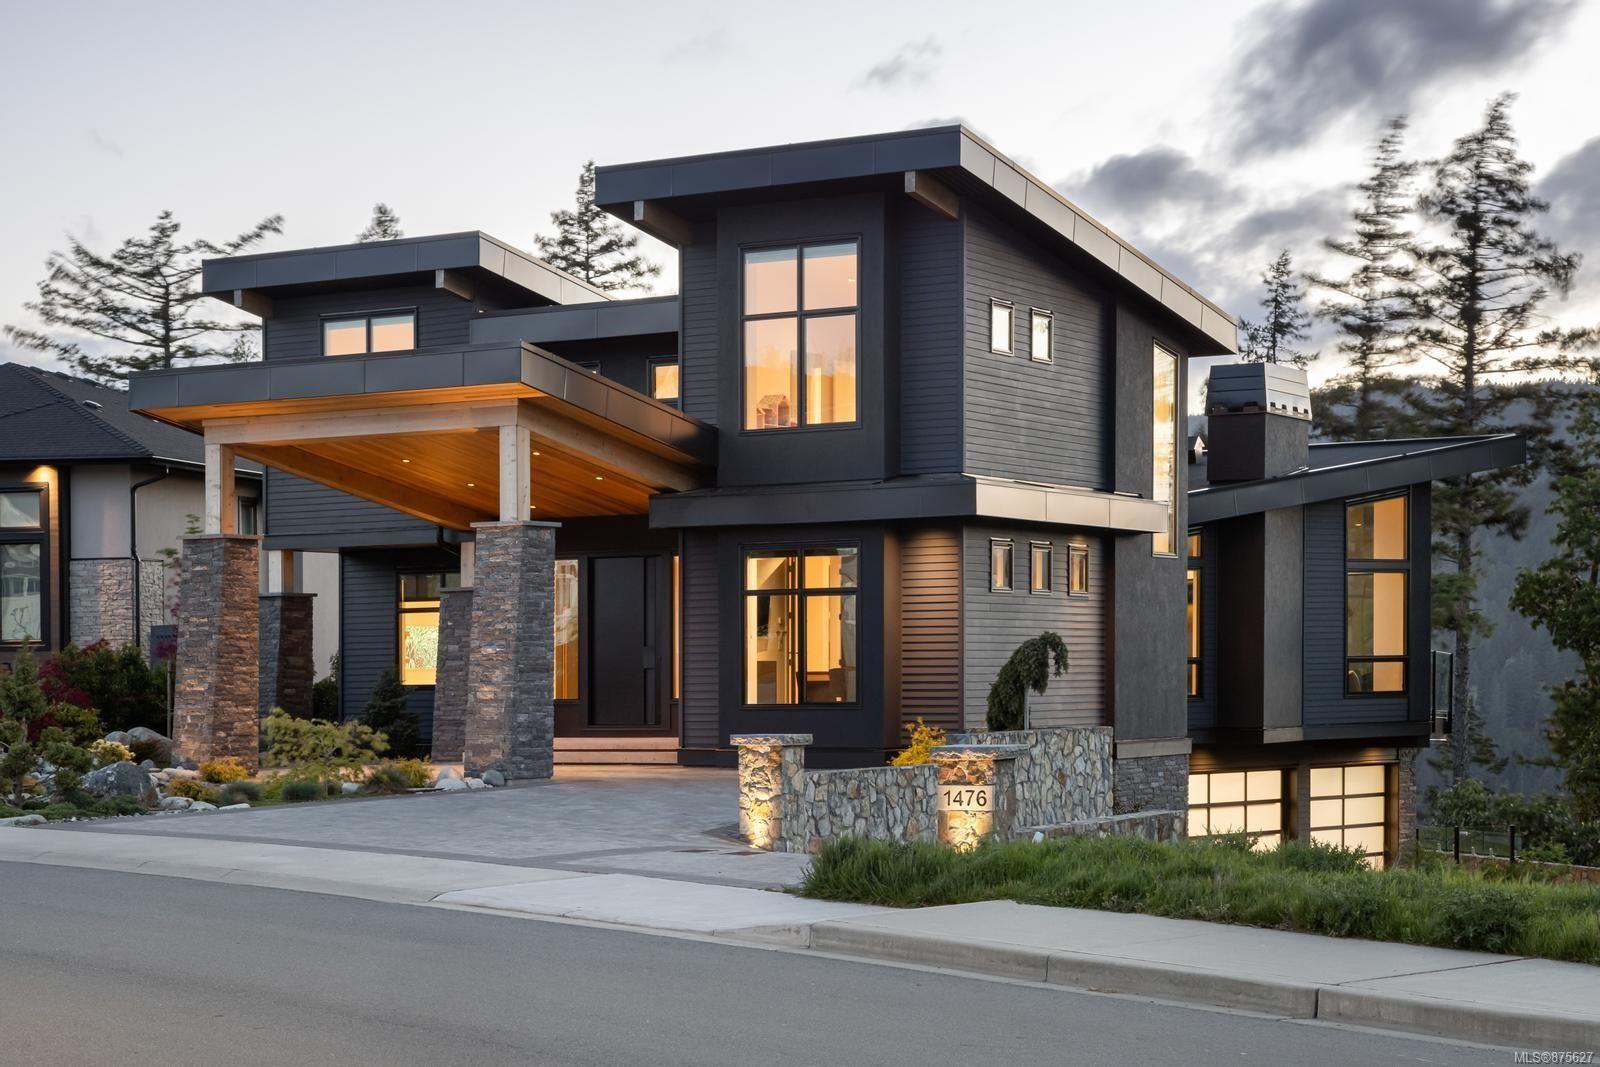 Main Photo: 1476 Pebble Pl in : La Bear Mountain House for sale (Langford)  : MLS®# 875627